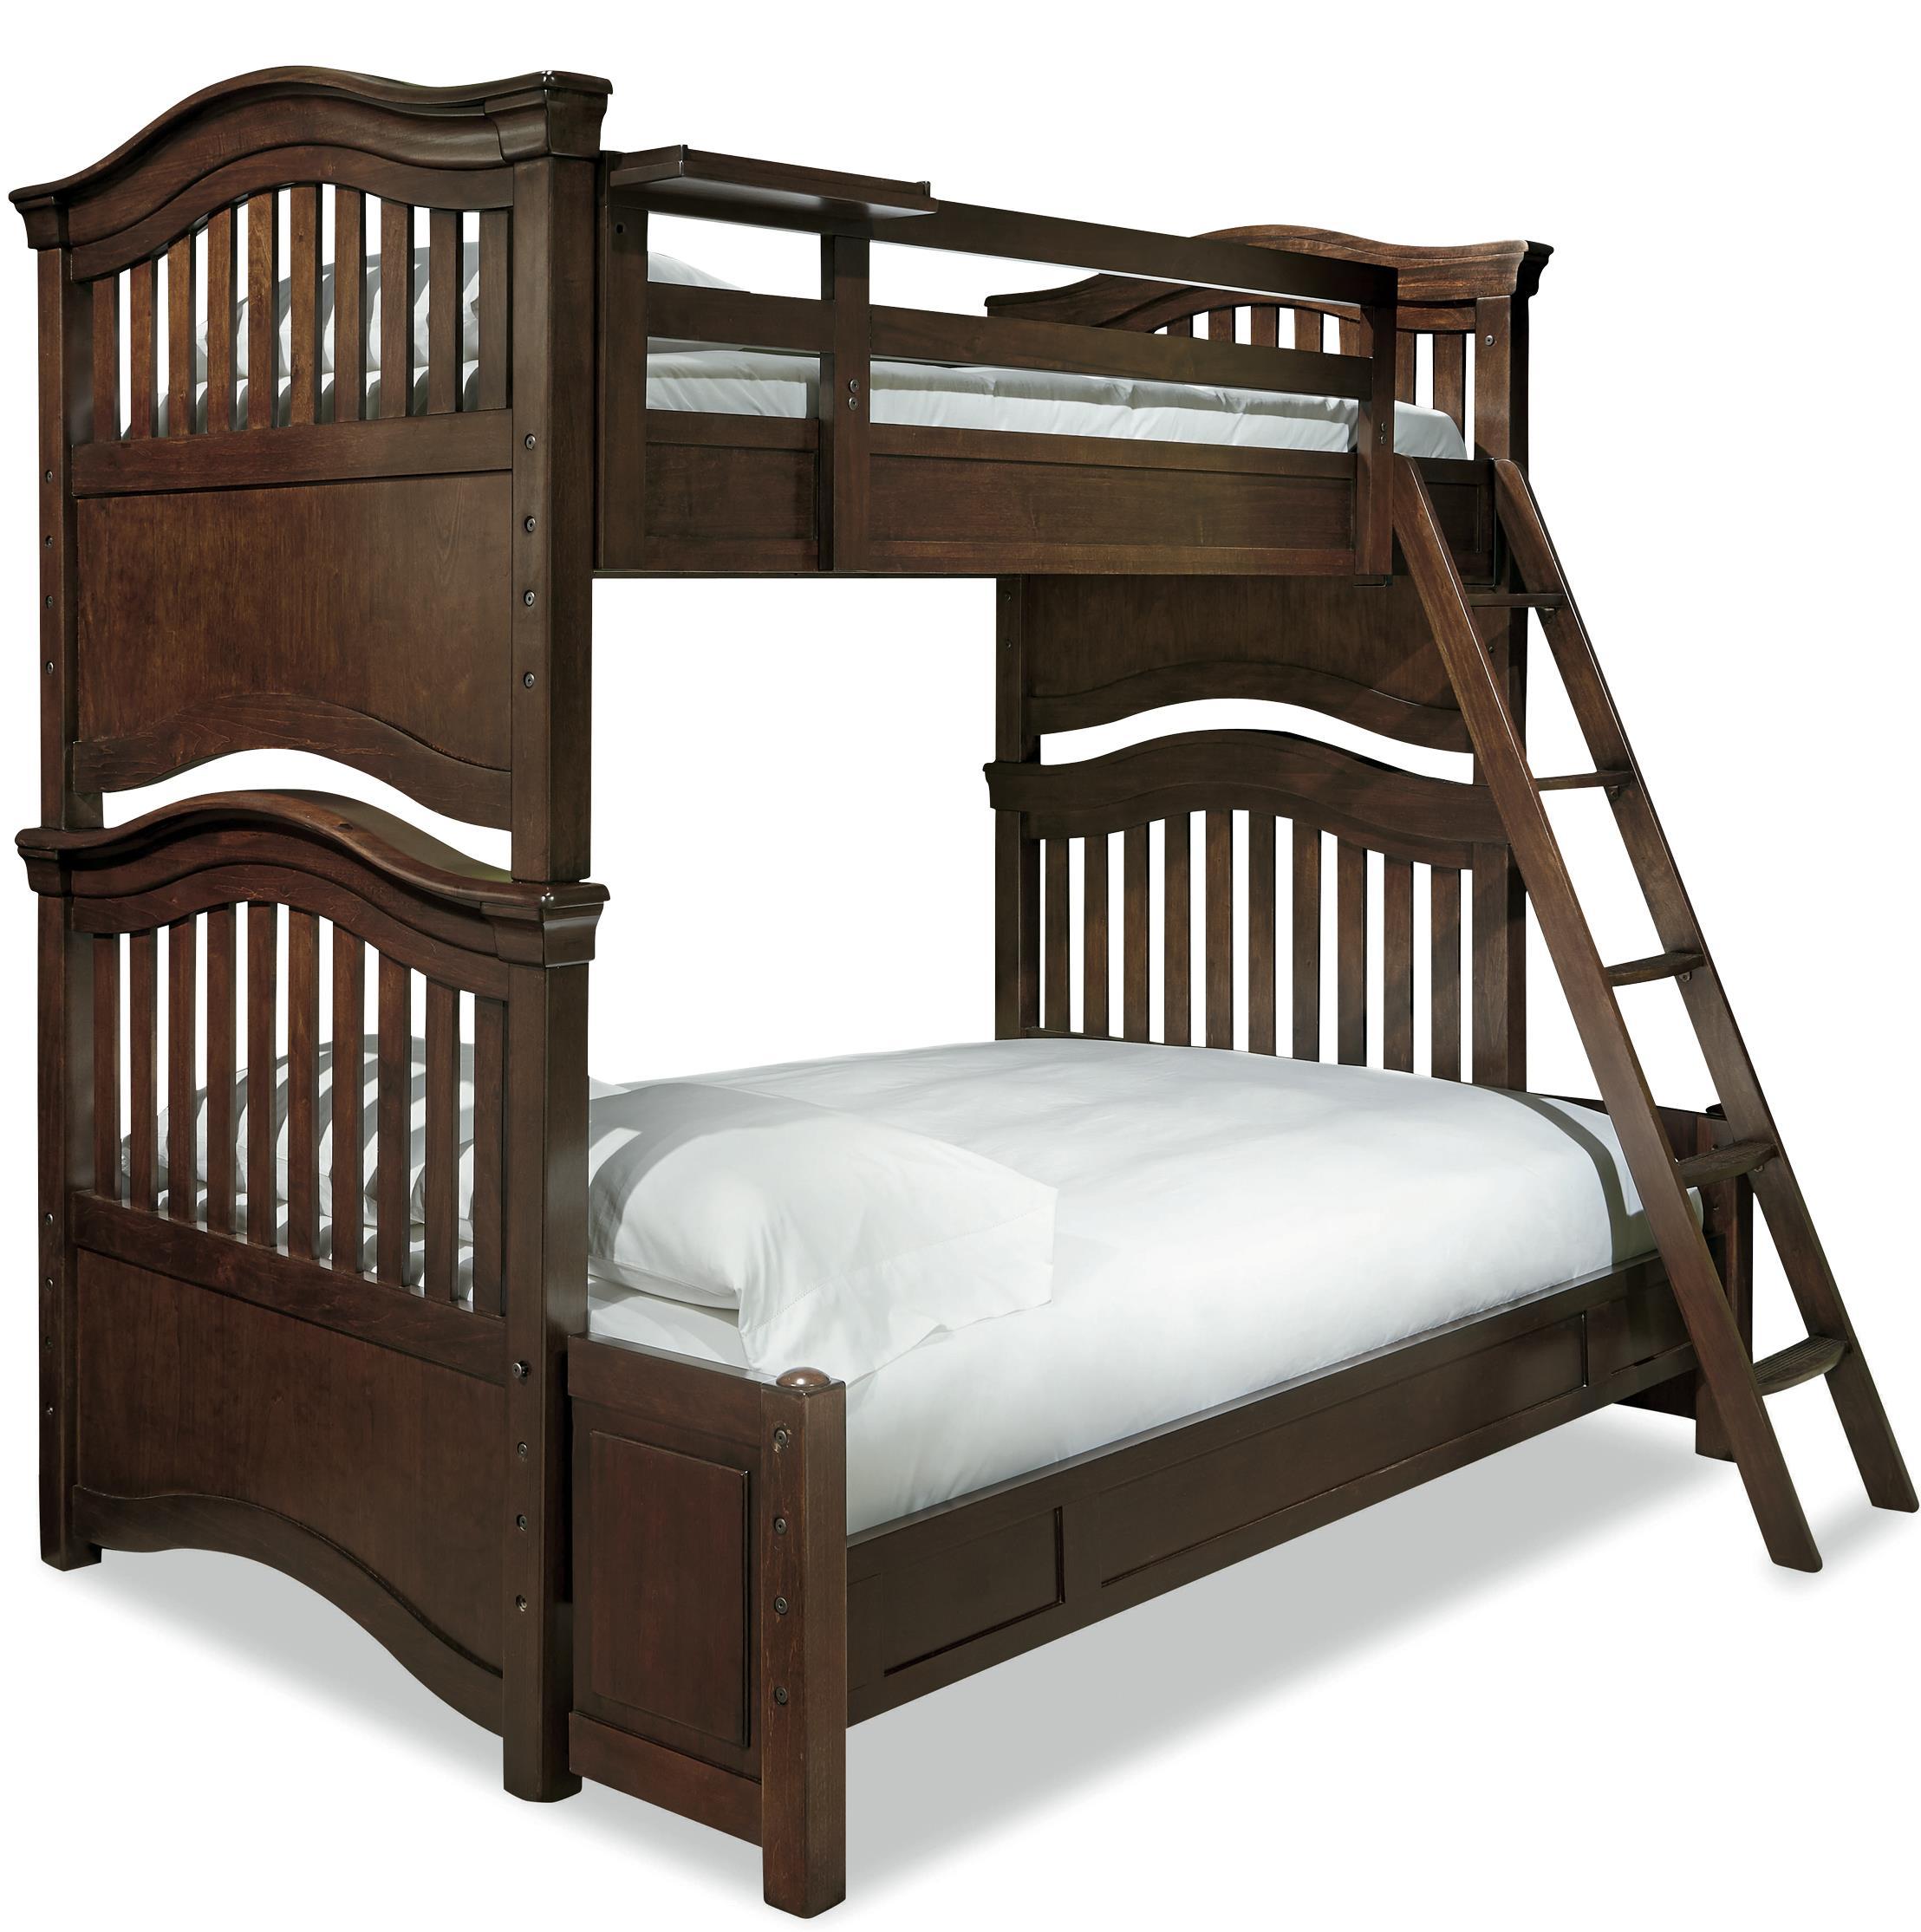 Smartstuff Classics 4.0 Twin Over Full Bunk Bed - Item Number: 1312590